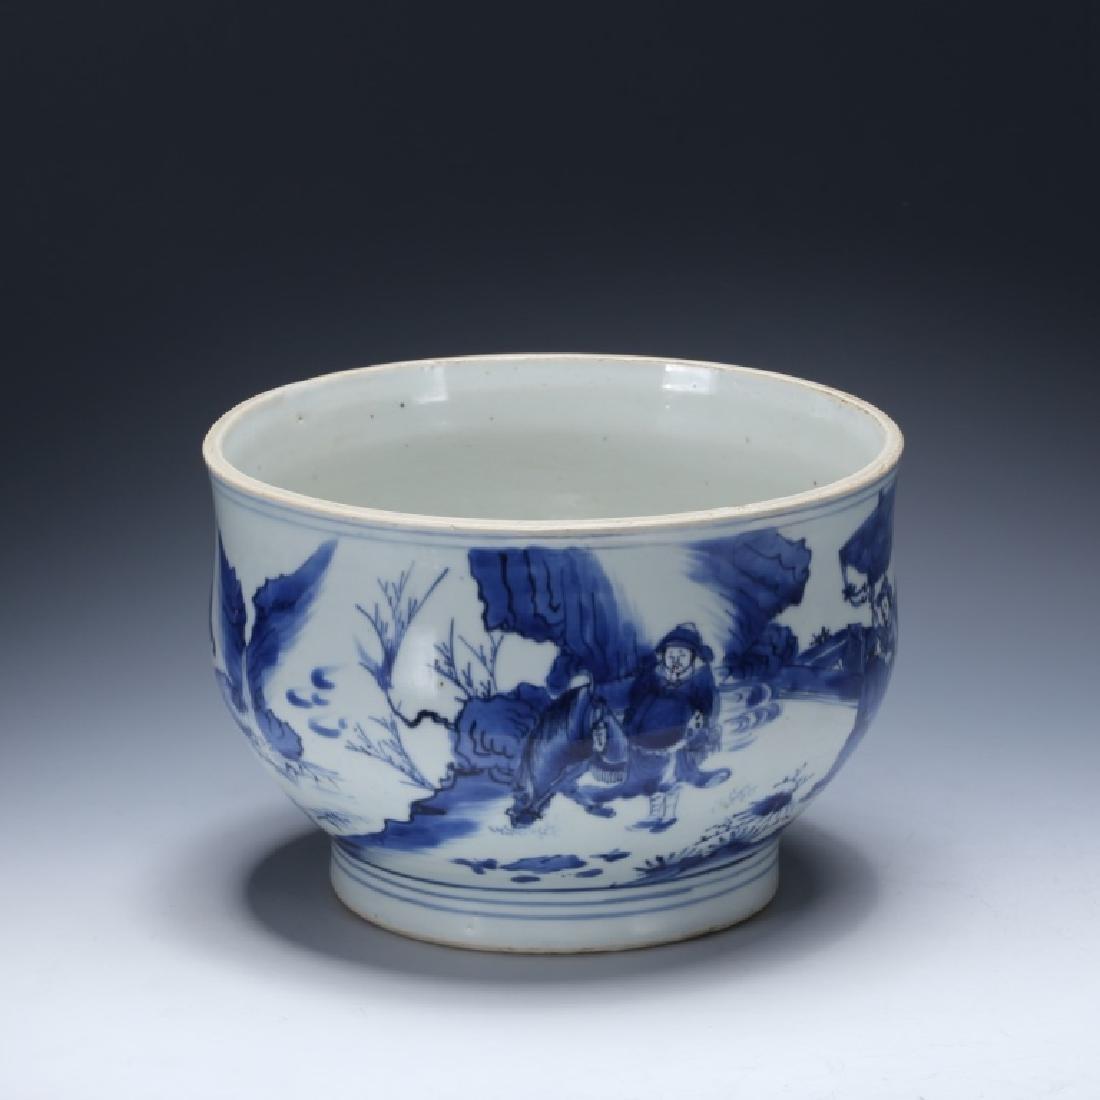 Chinese Transitional B & W Porcelain Pot